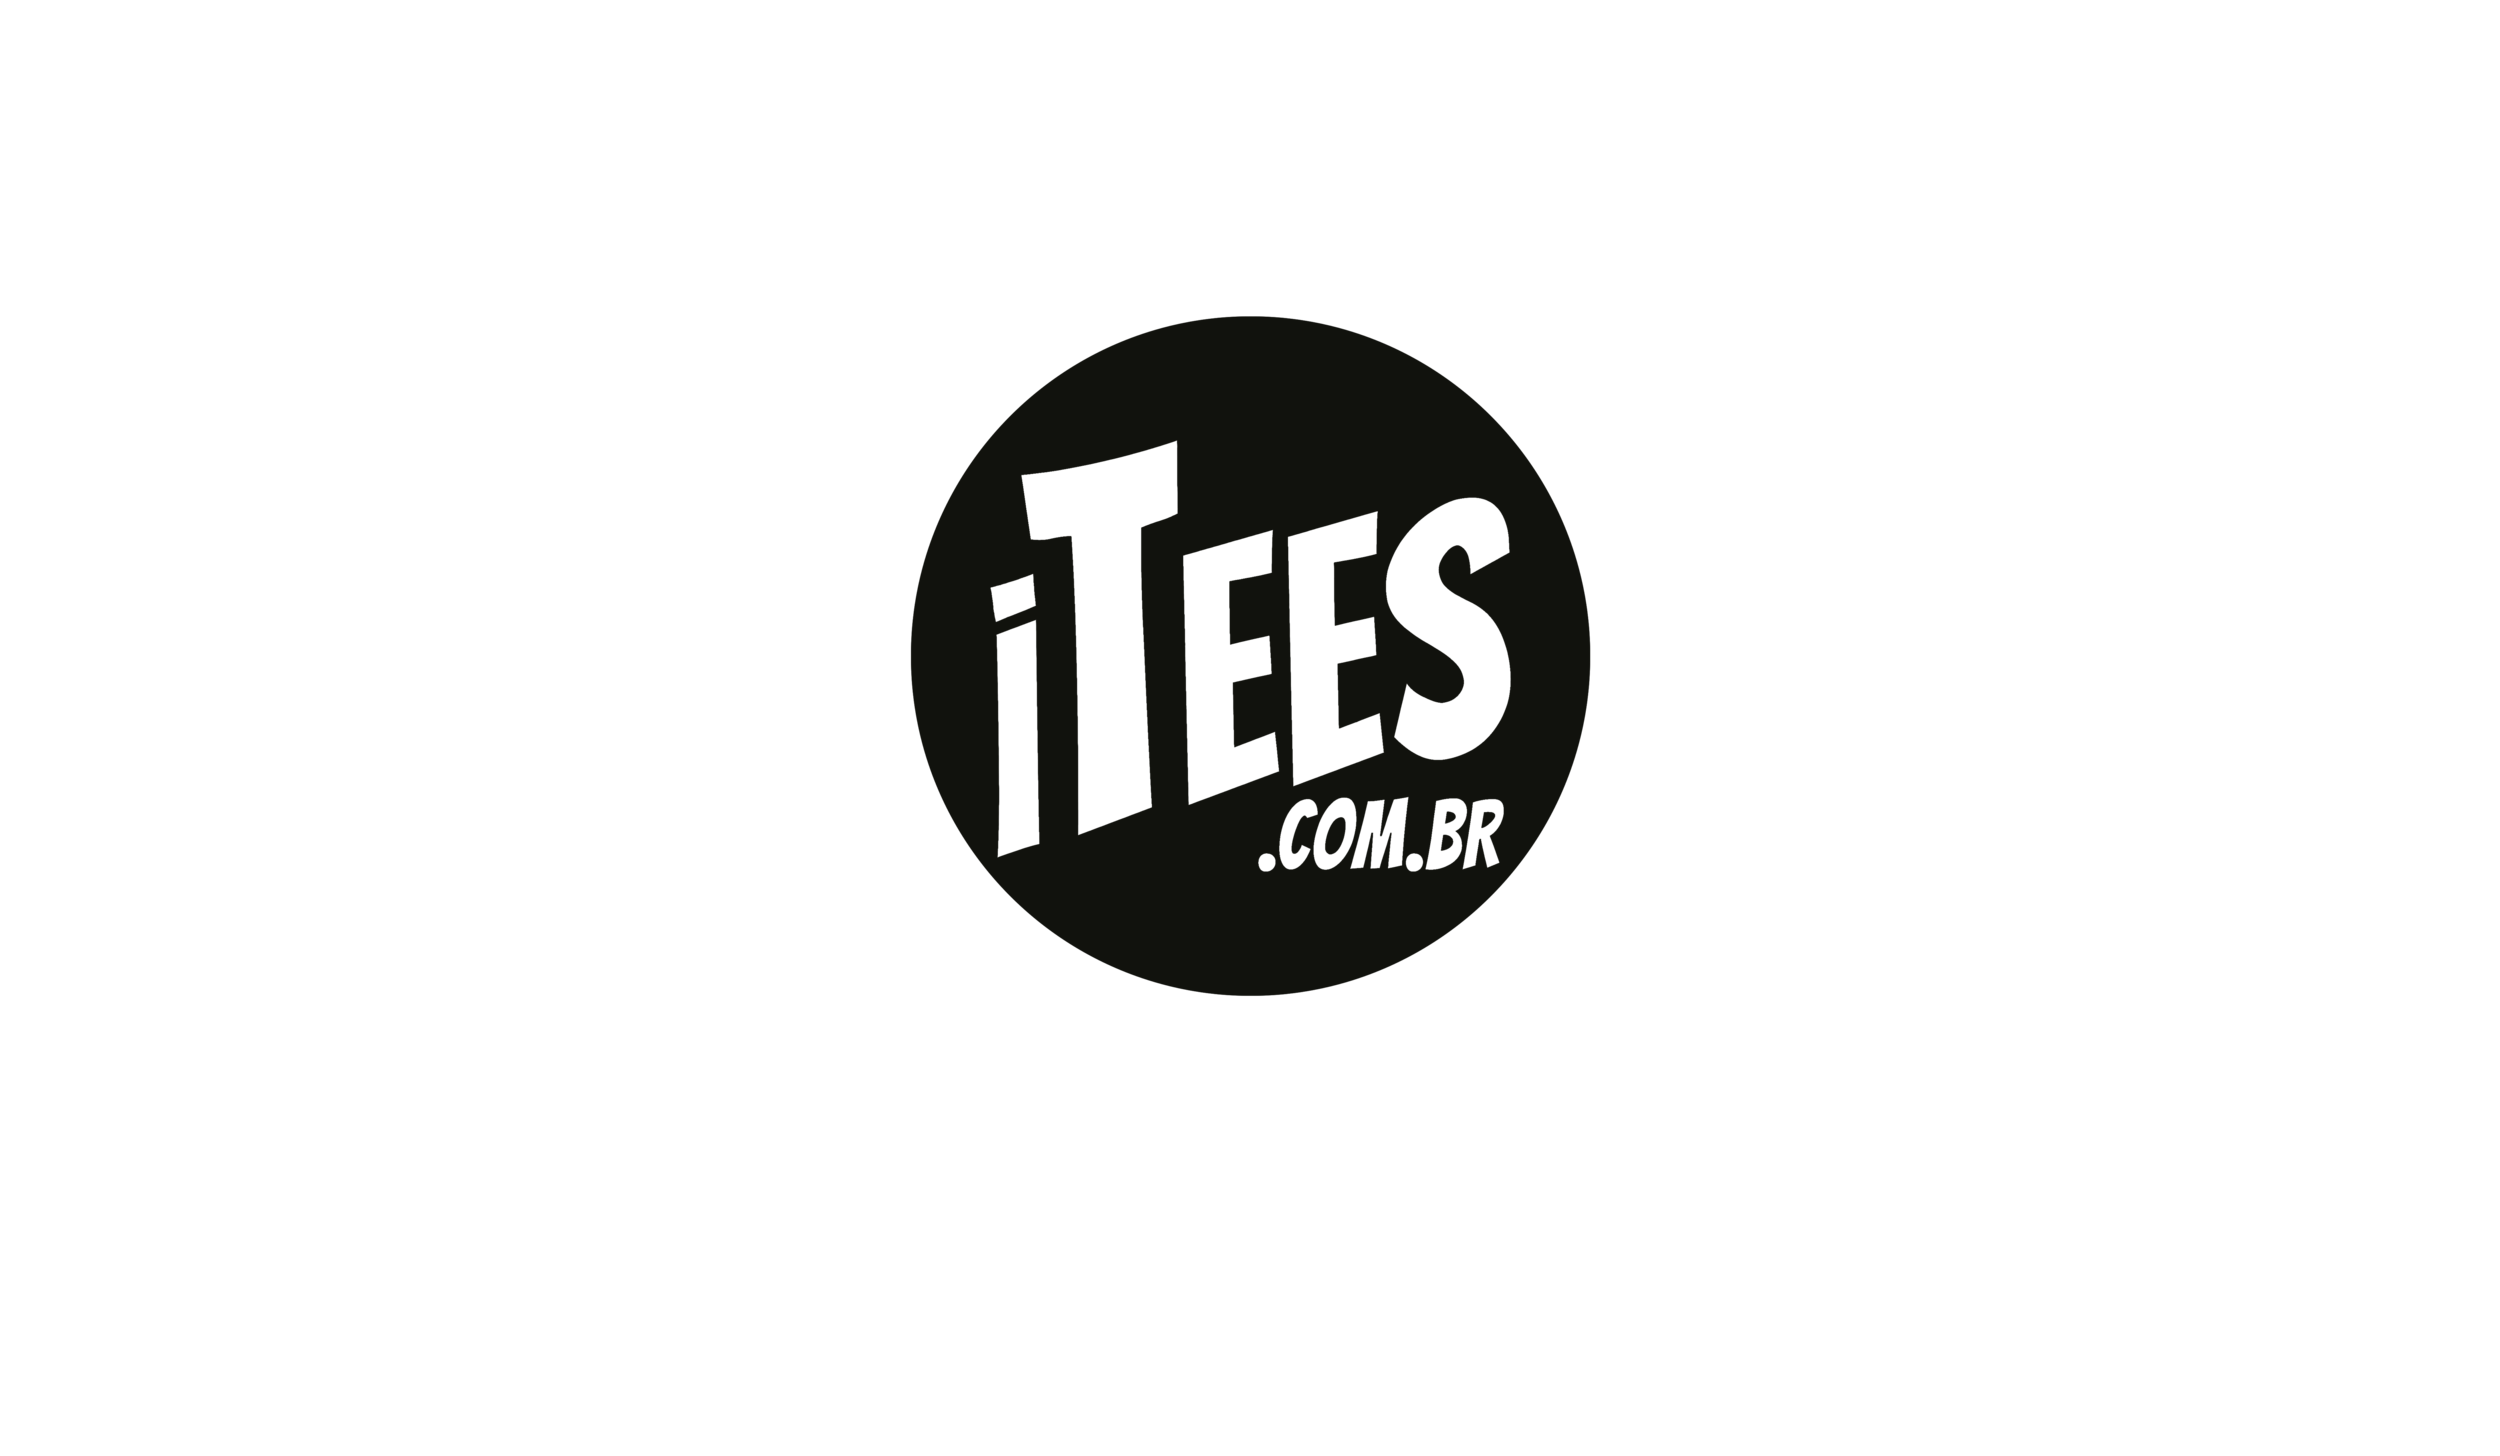 Logo-iTees-camisetas-copy-2.png